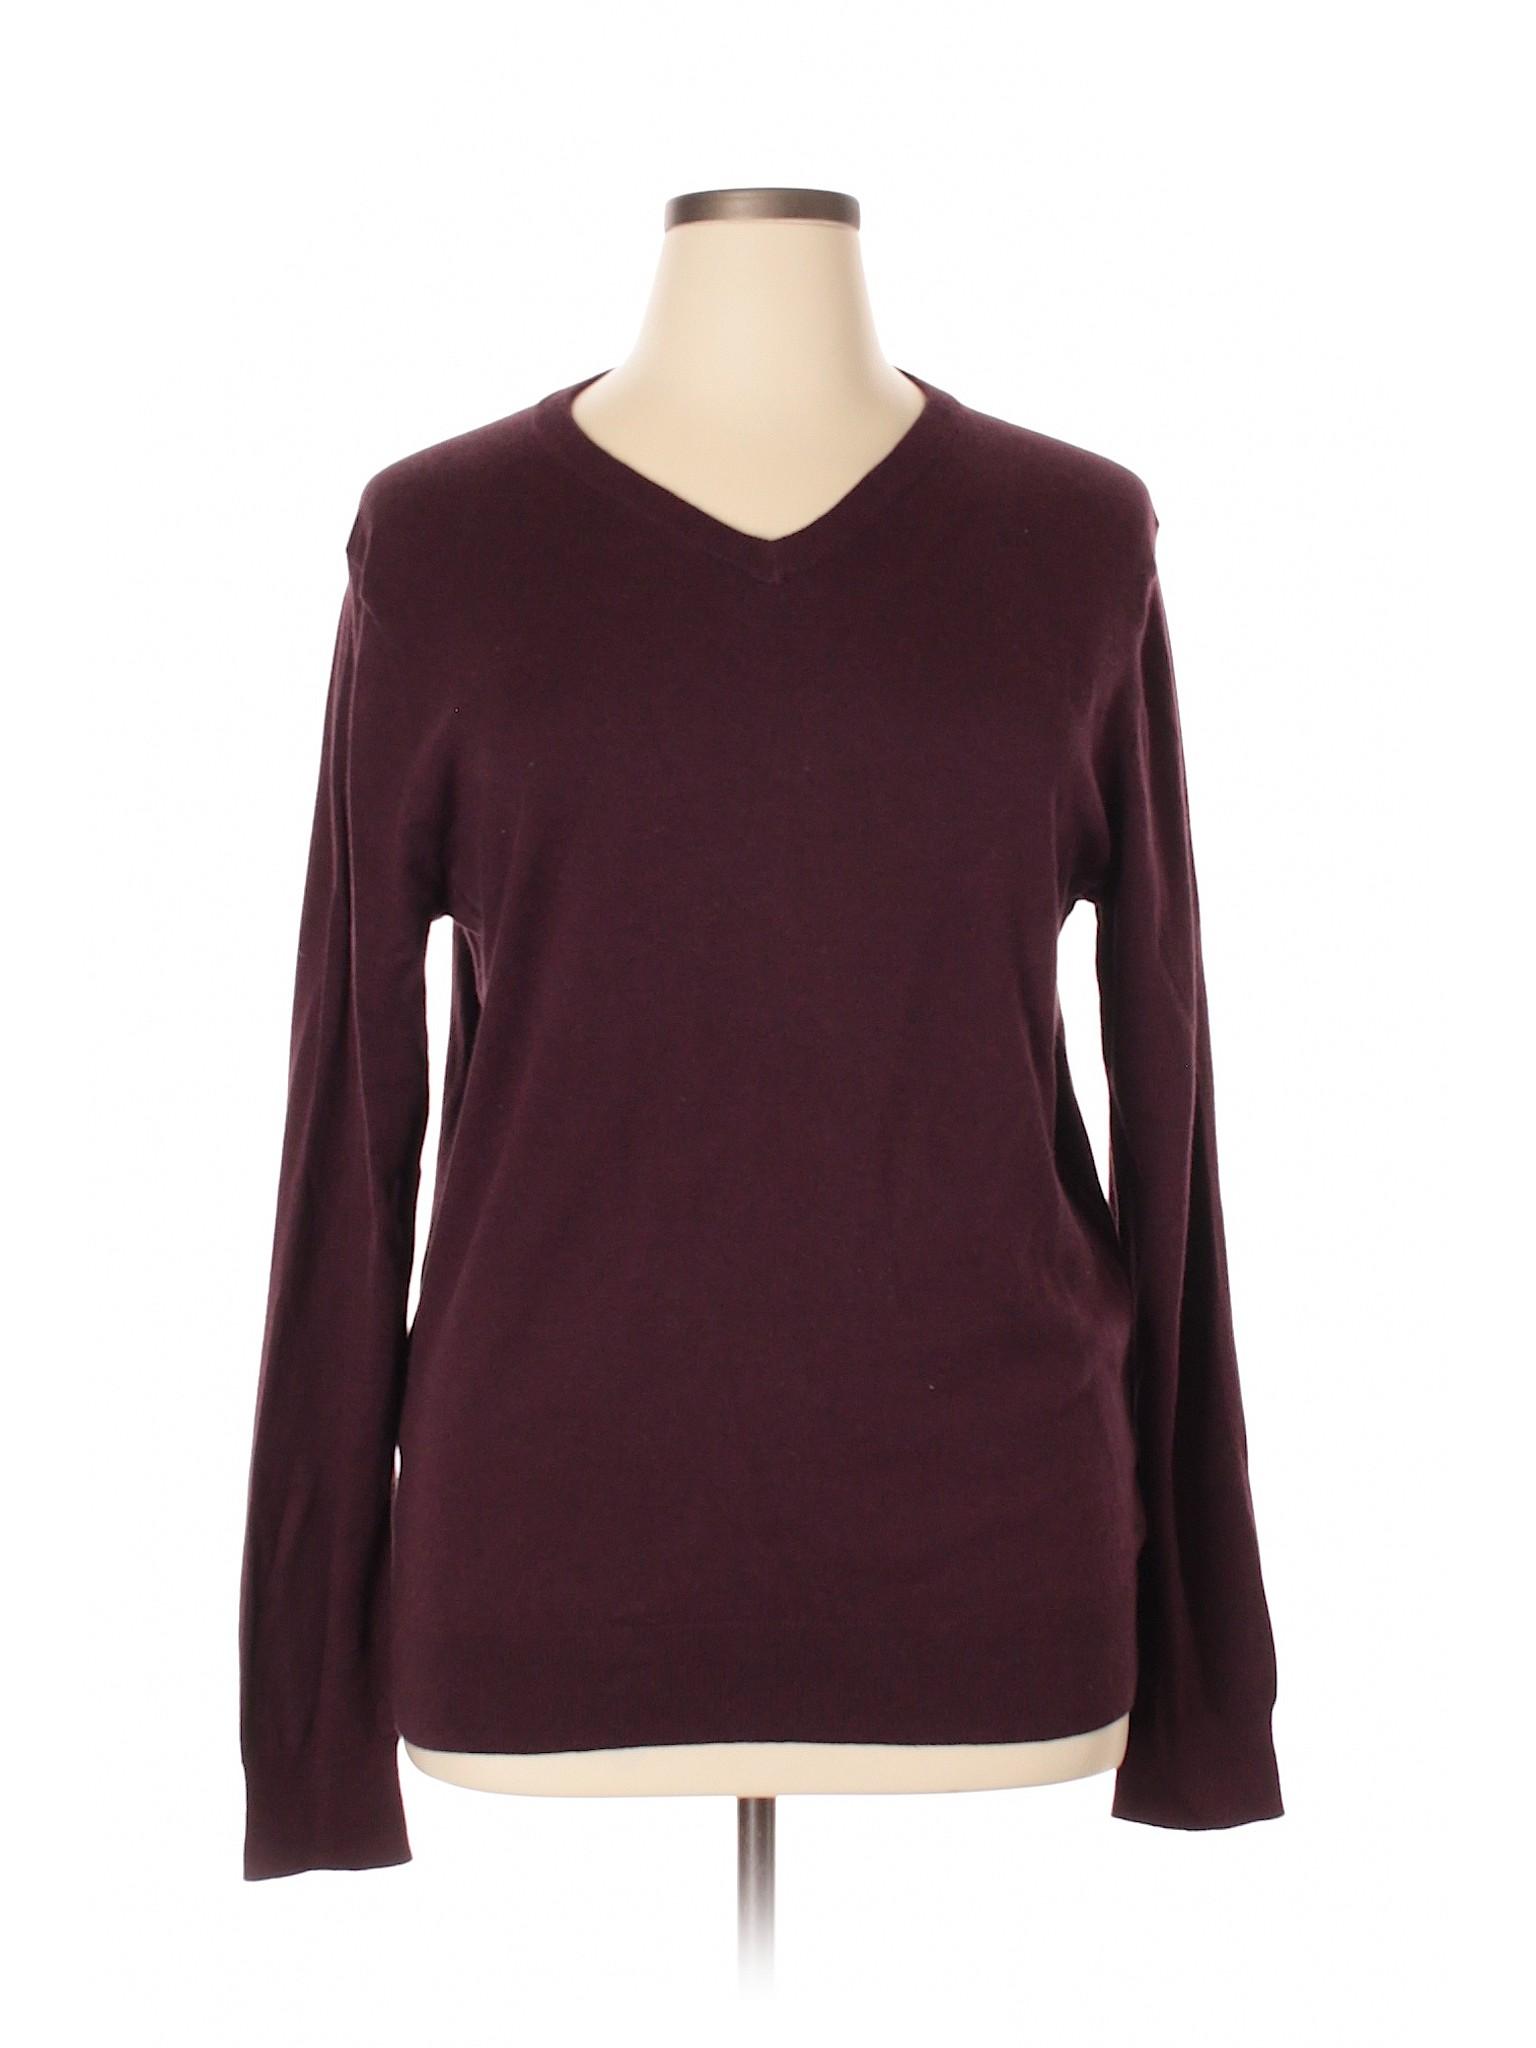 Boutique Sweater style Pullover life SONOMA BwqSpf